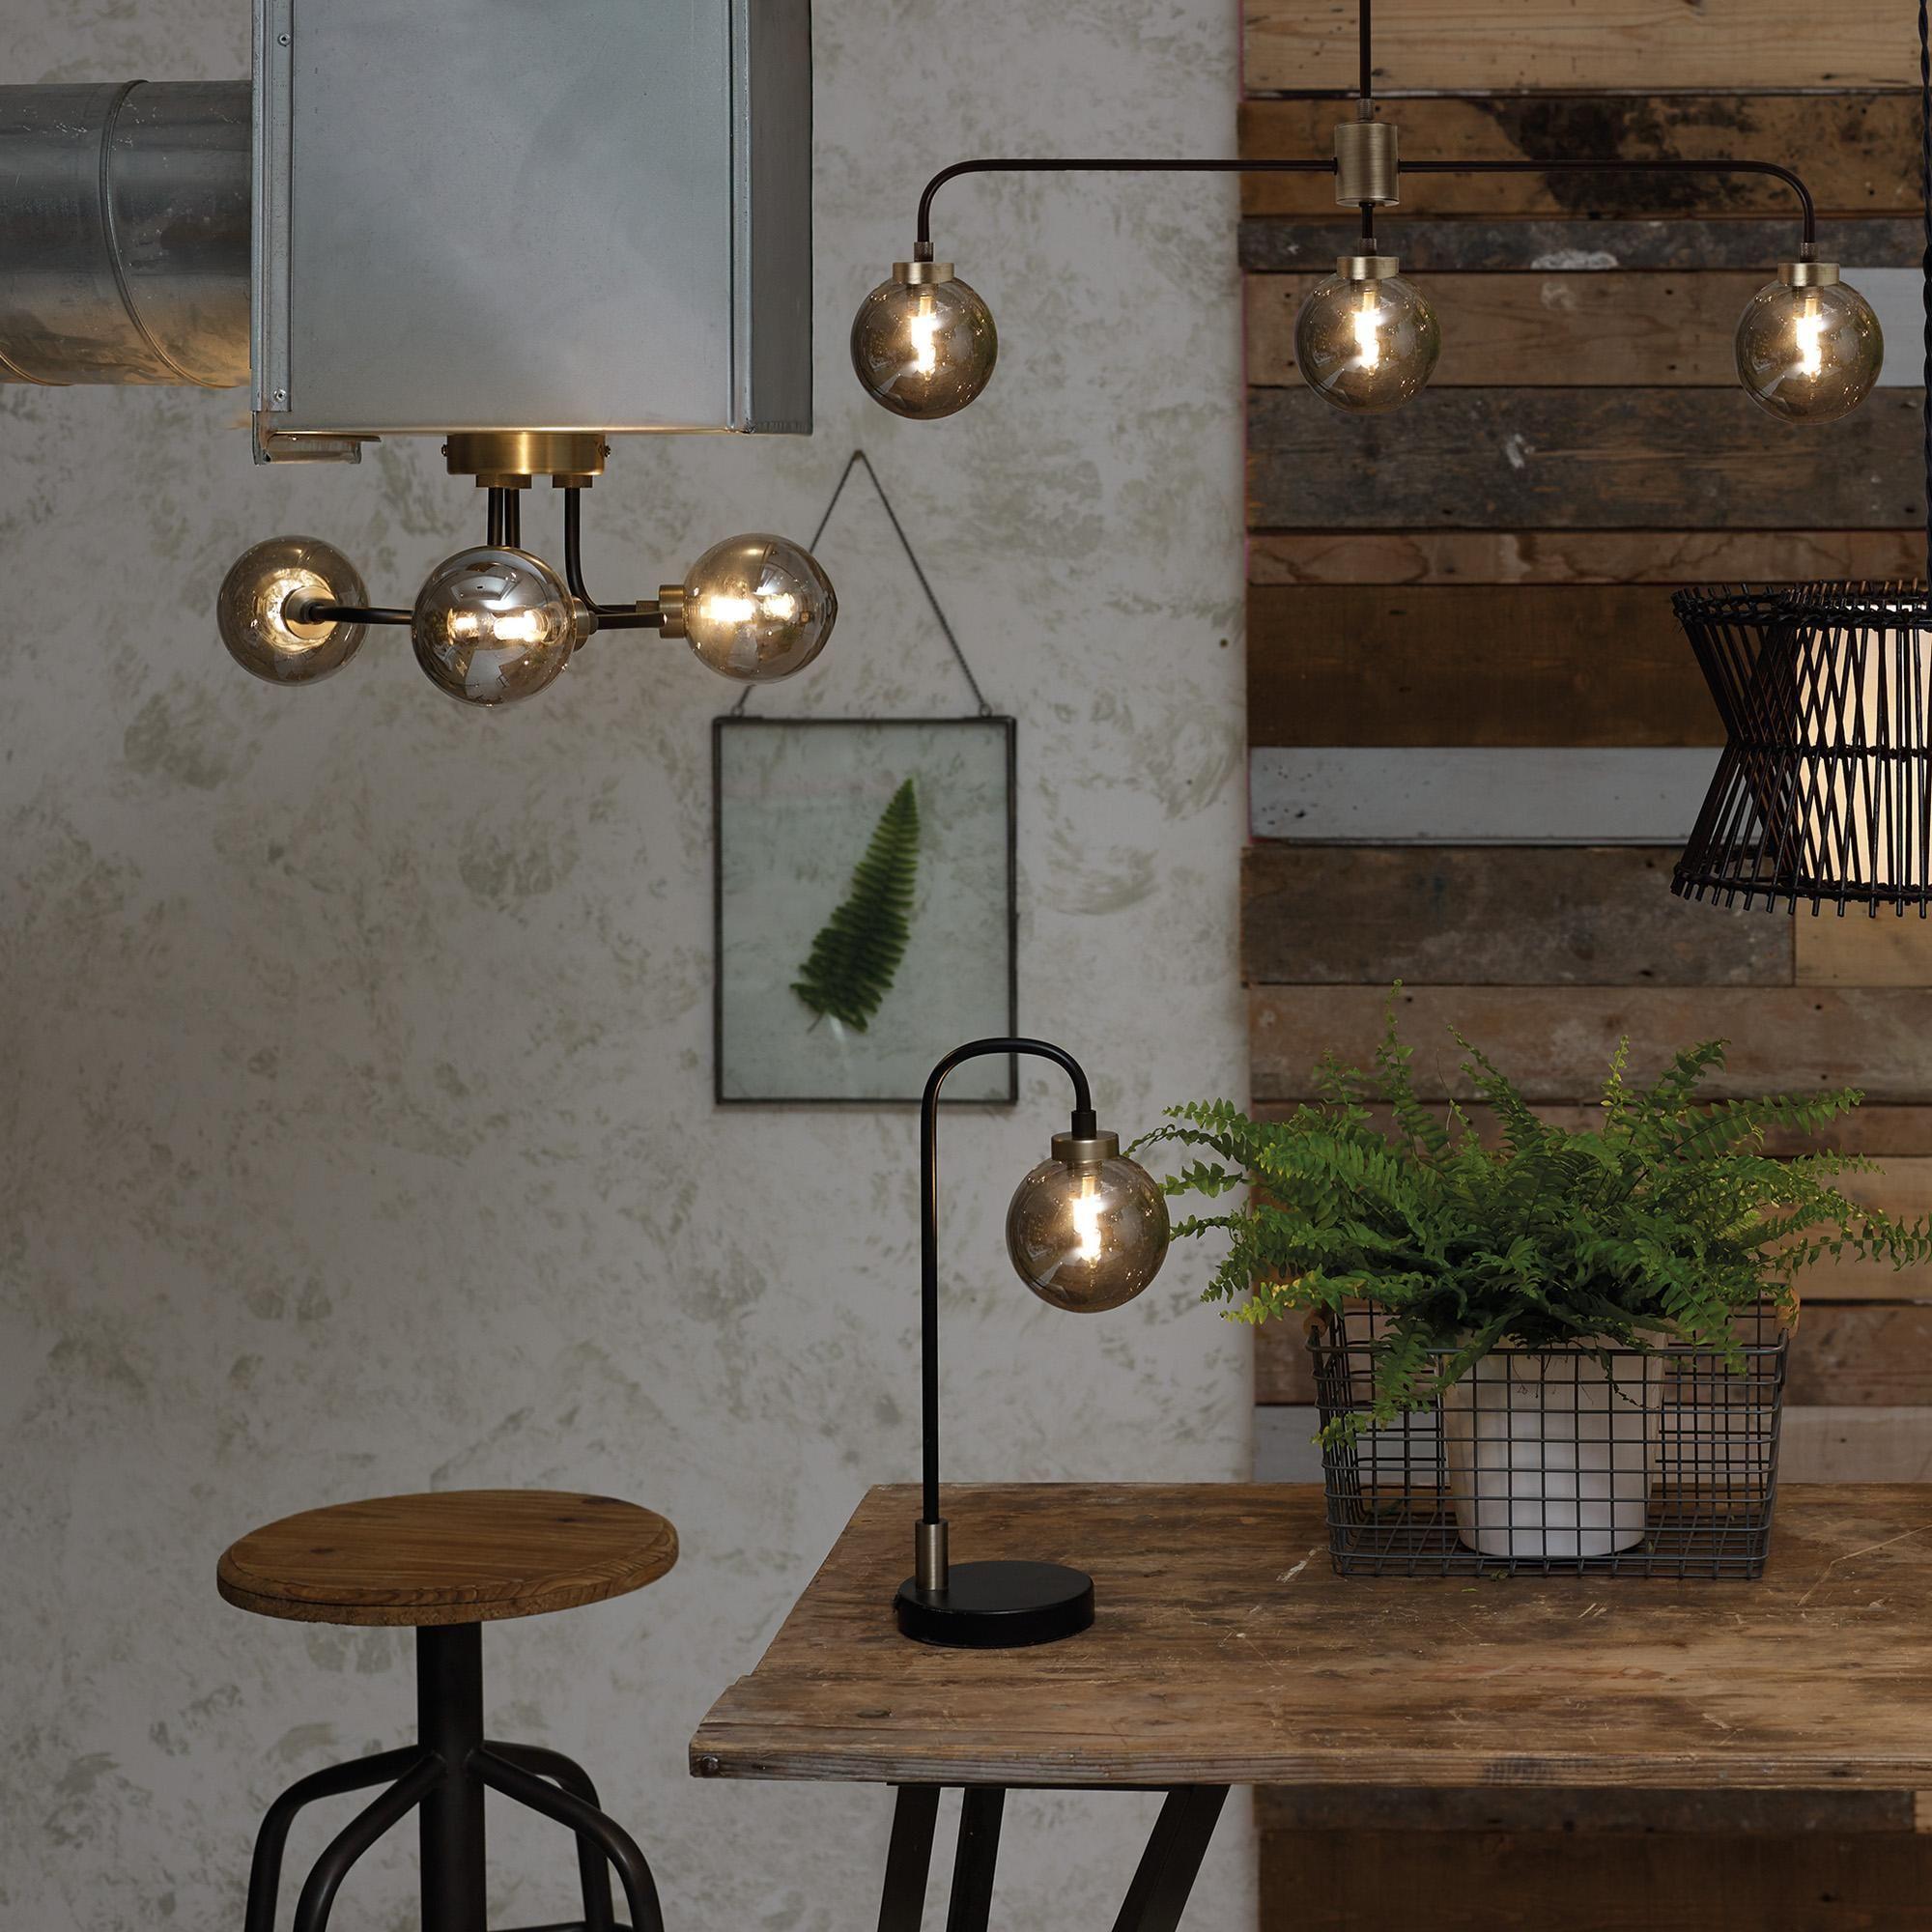 industrial chic lighting. Tanner Lighting Collection   Dunelm · Terraced HouseBedroom IdeasVictorian TerraceIndustrial Chic Industrial L